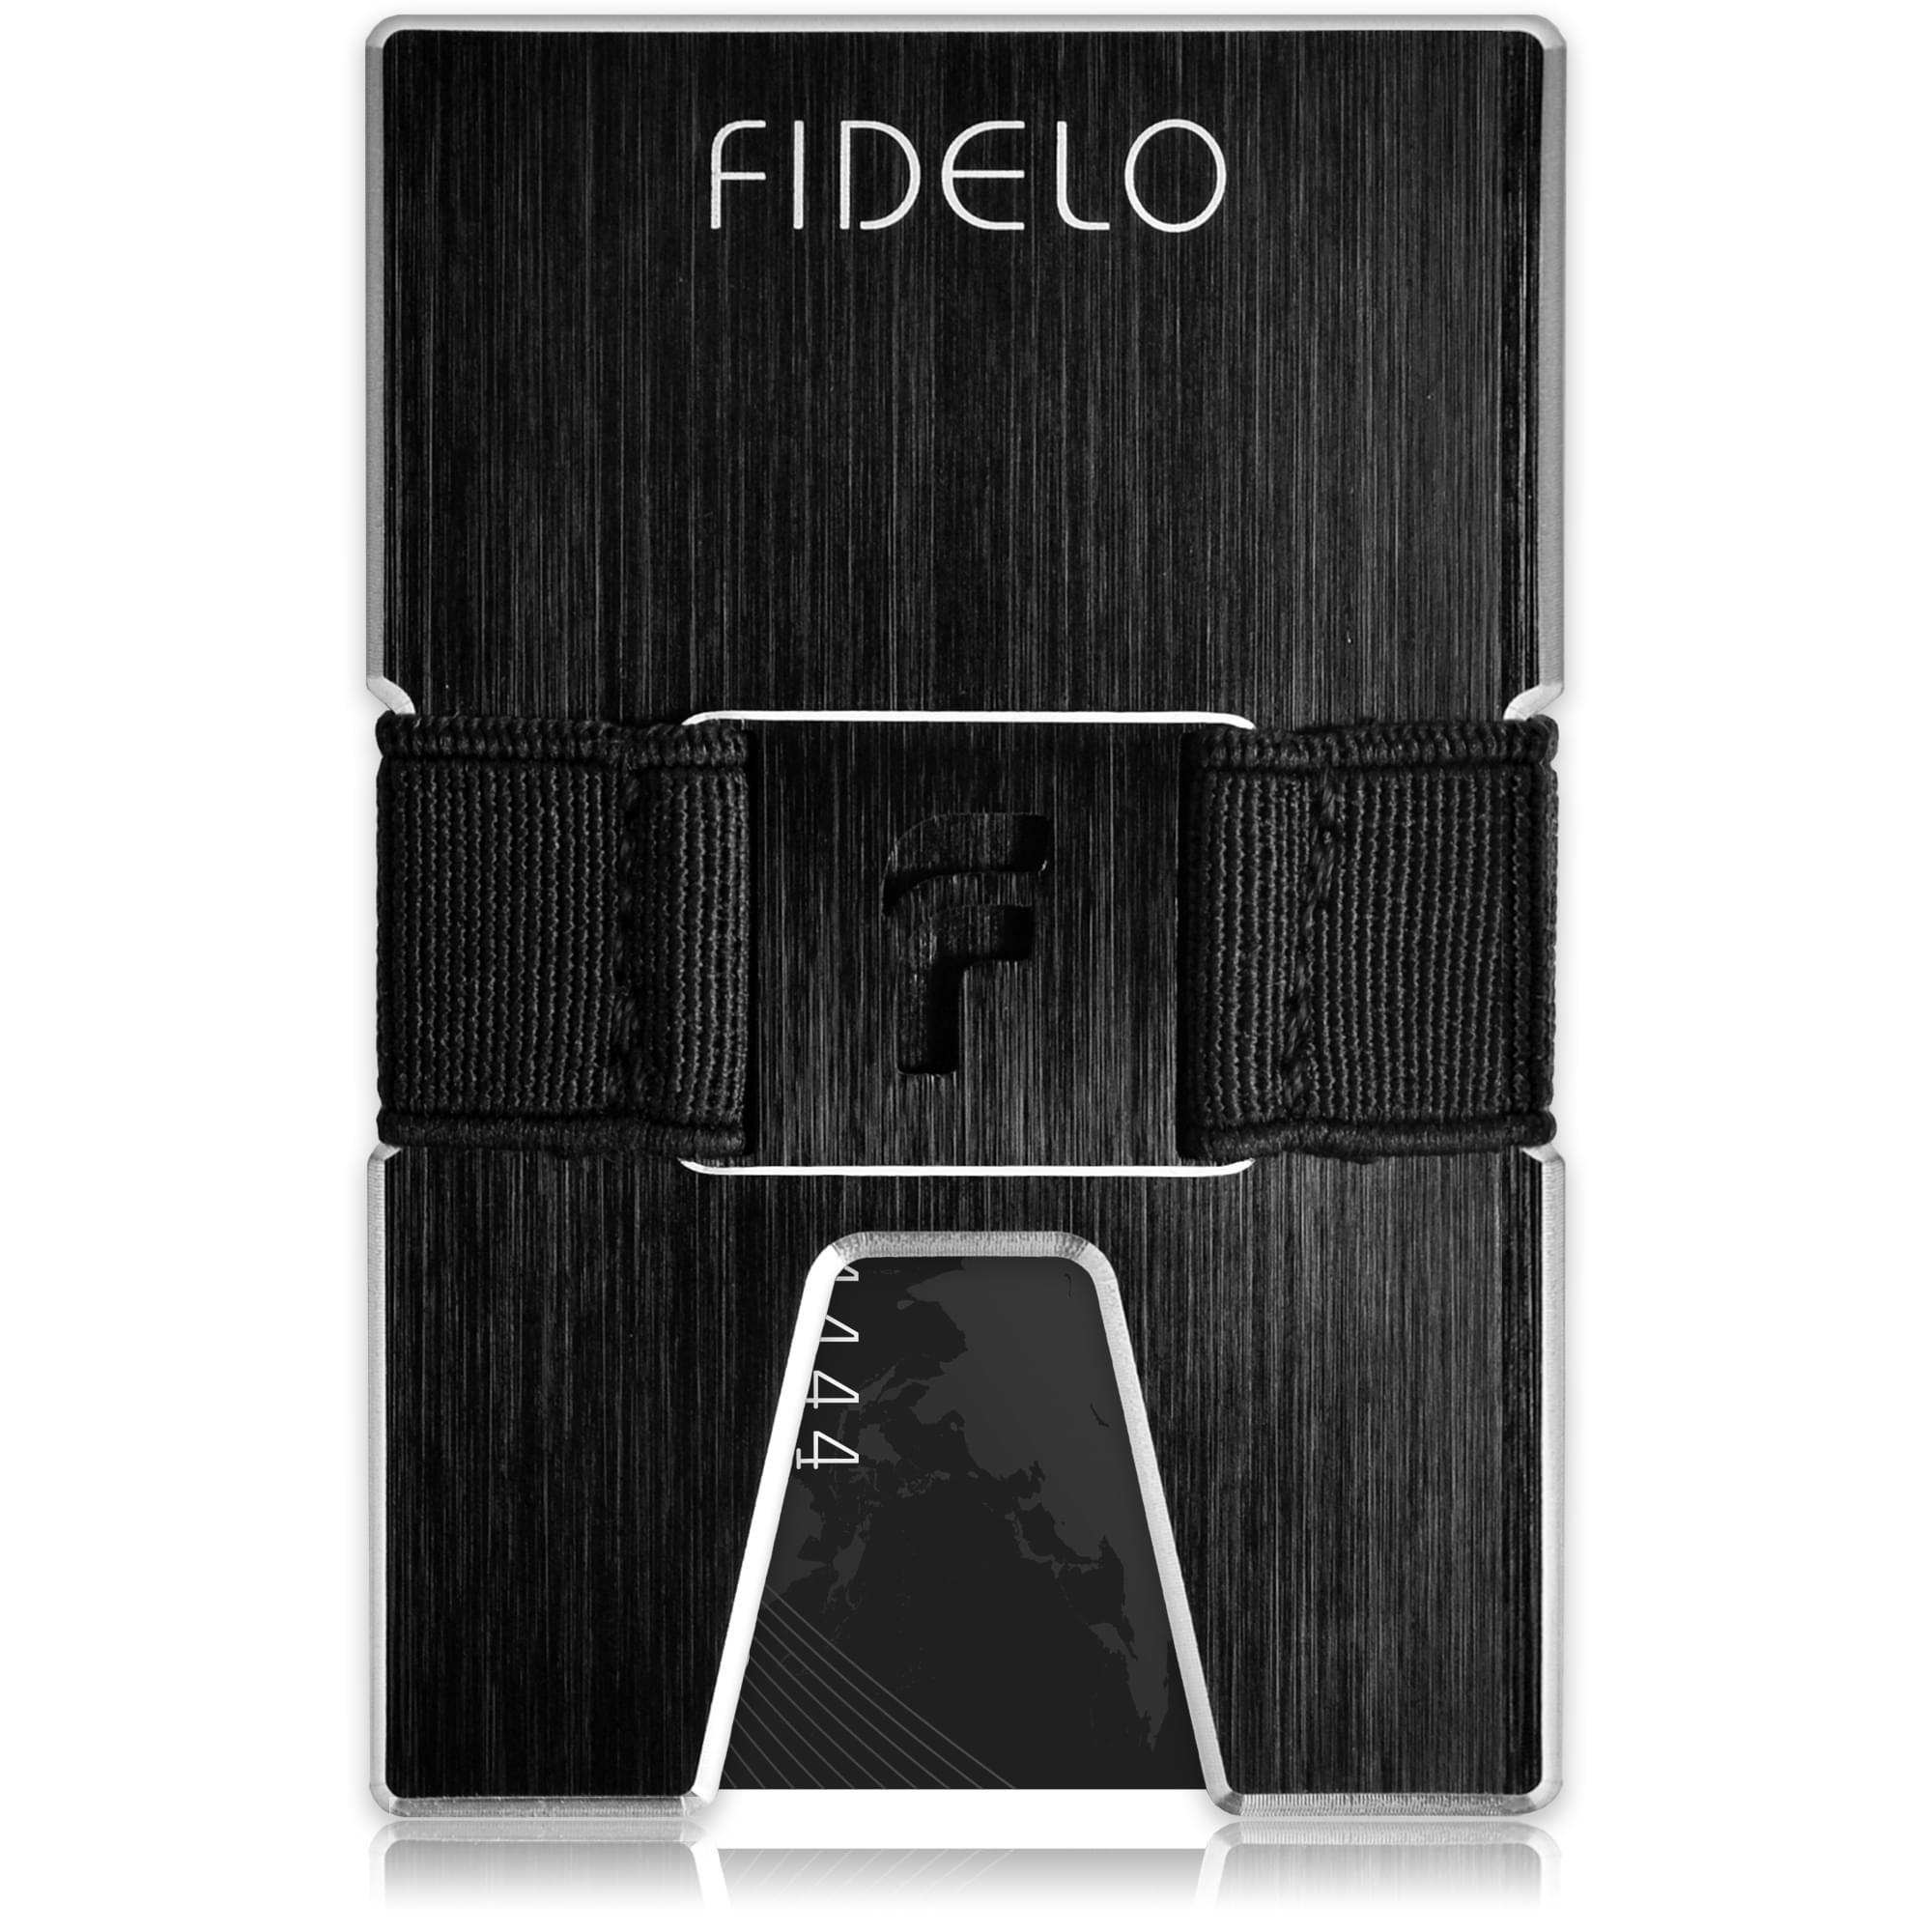 FIDELO slim carbon fiber minimalist wallet with cash in money clip band